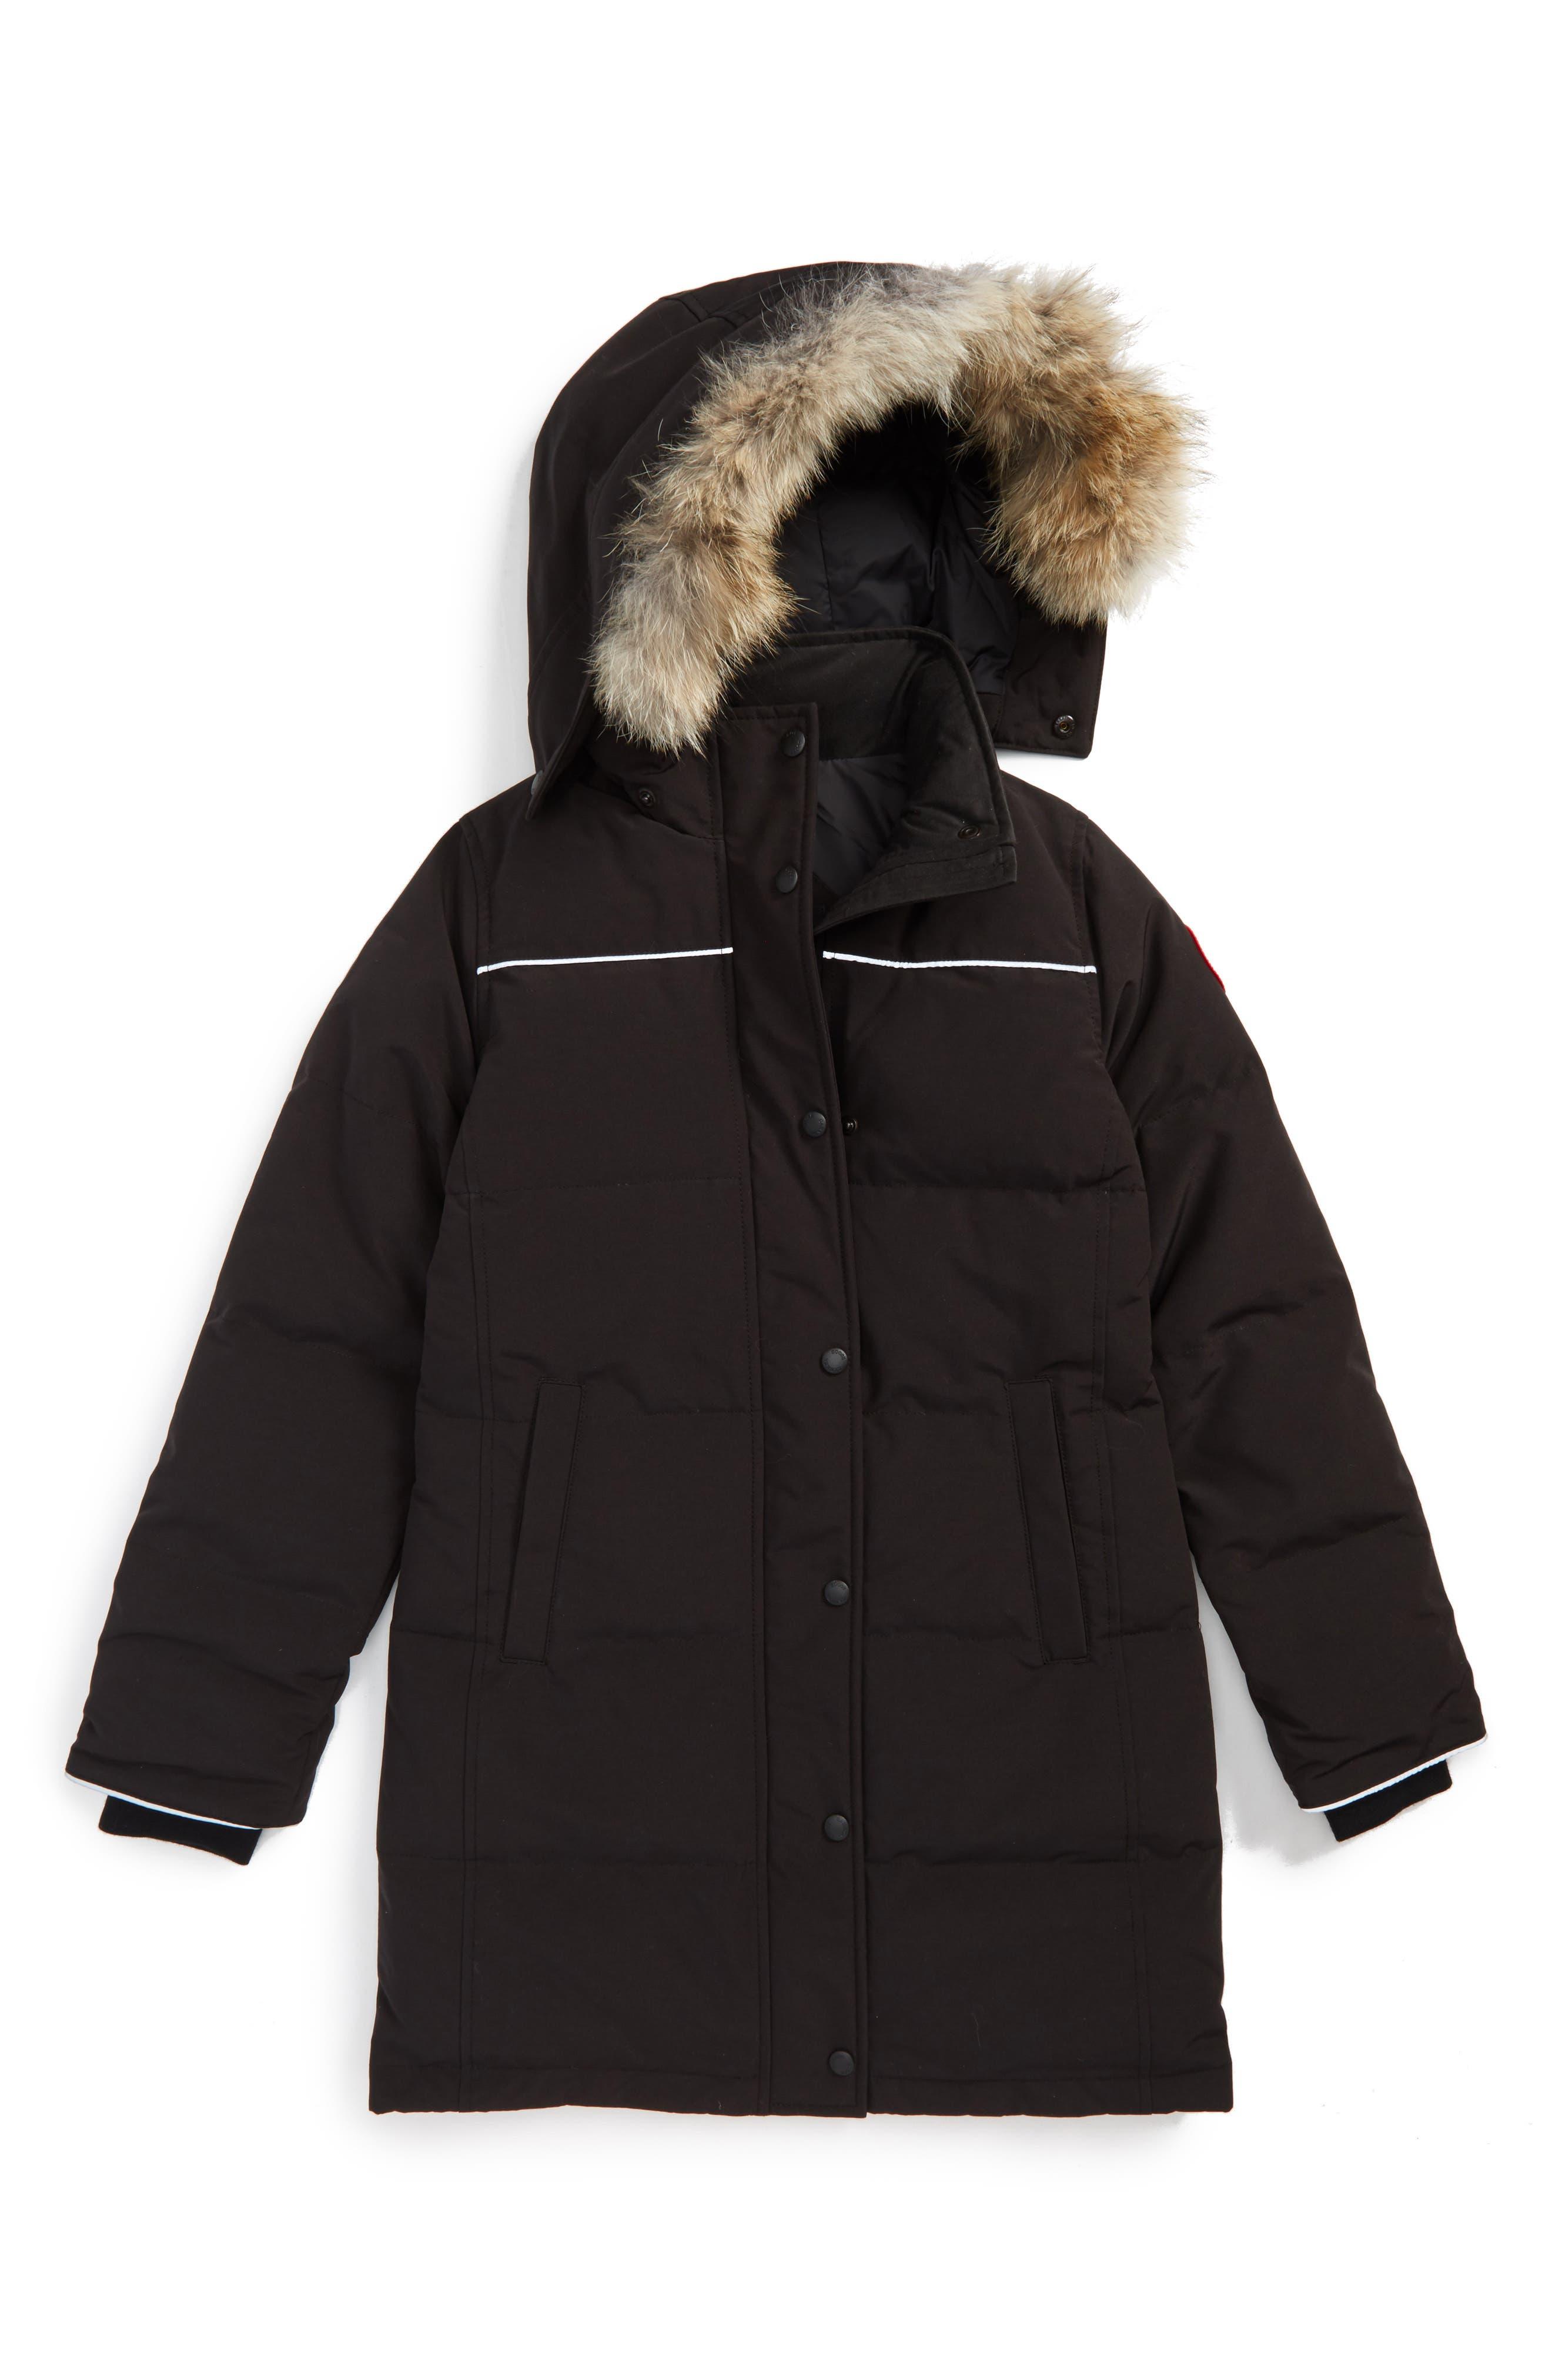 CANADA GOOSE Juniper Down Parka with Genuine Coyote Fur Trim, Main, color, BLACK